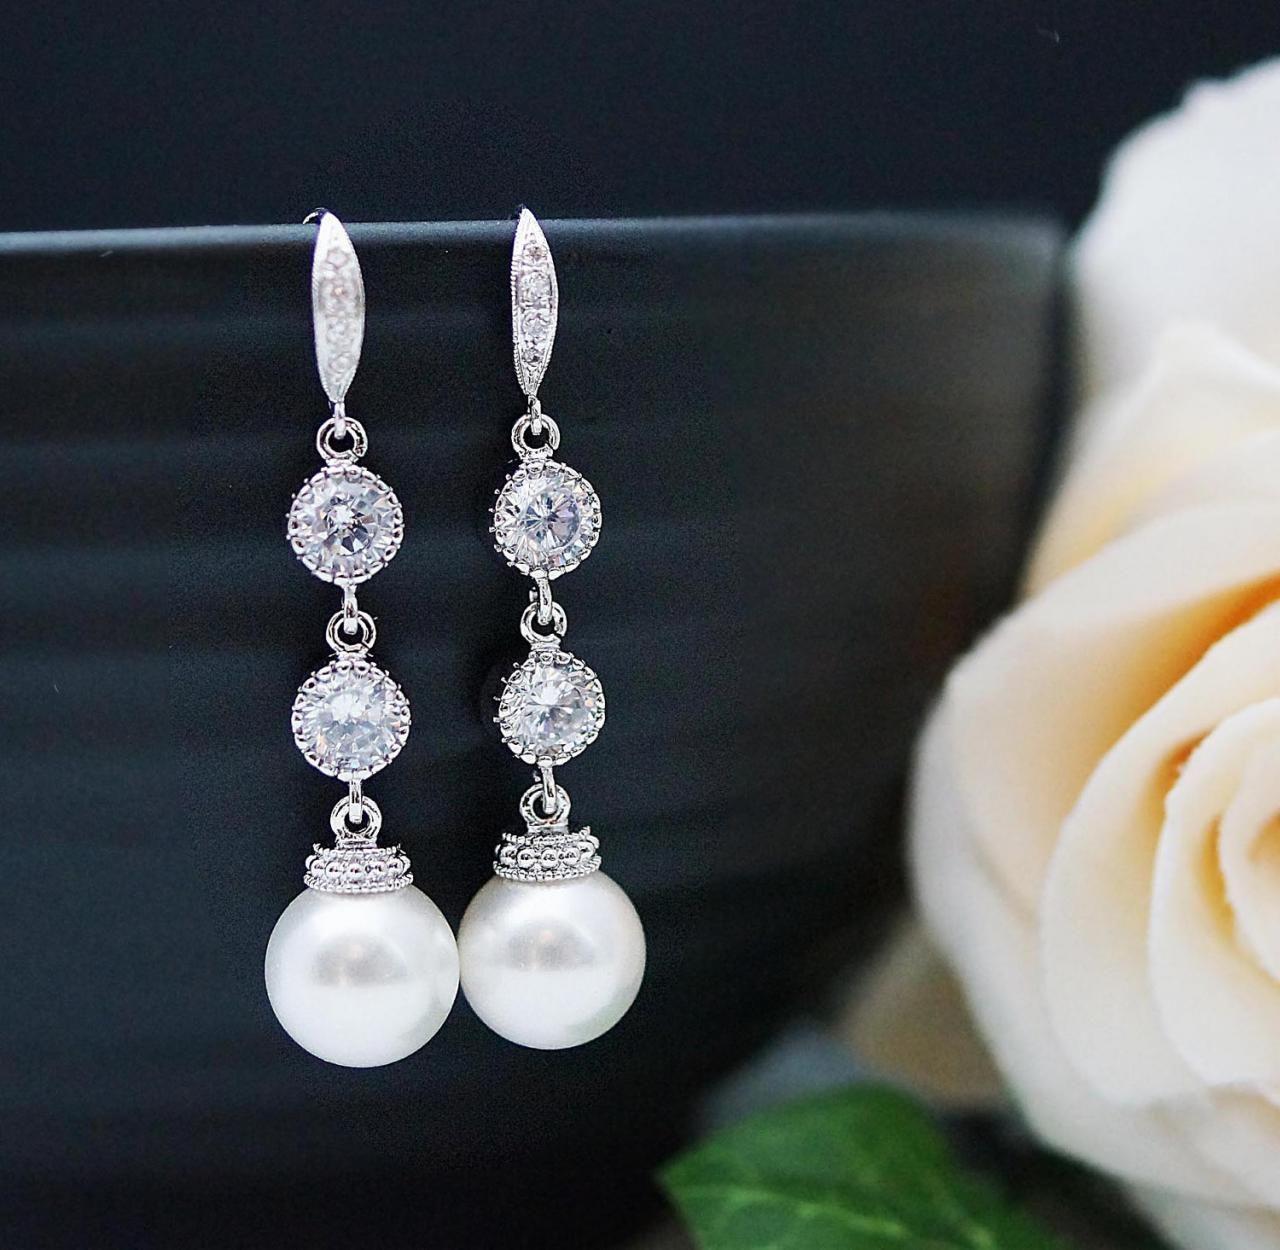 Wedding Dangle Earrings Bridal Jewelry Bridal Earrings Bridesmaid Earrings Crystal White Swarovski Pearls and Cubic Zirconia Connectors